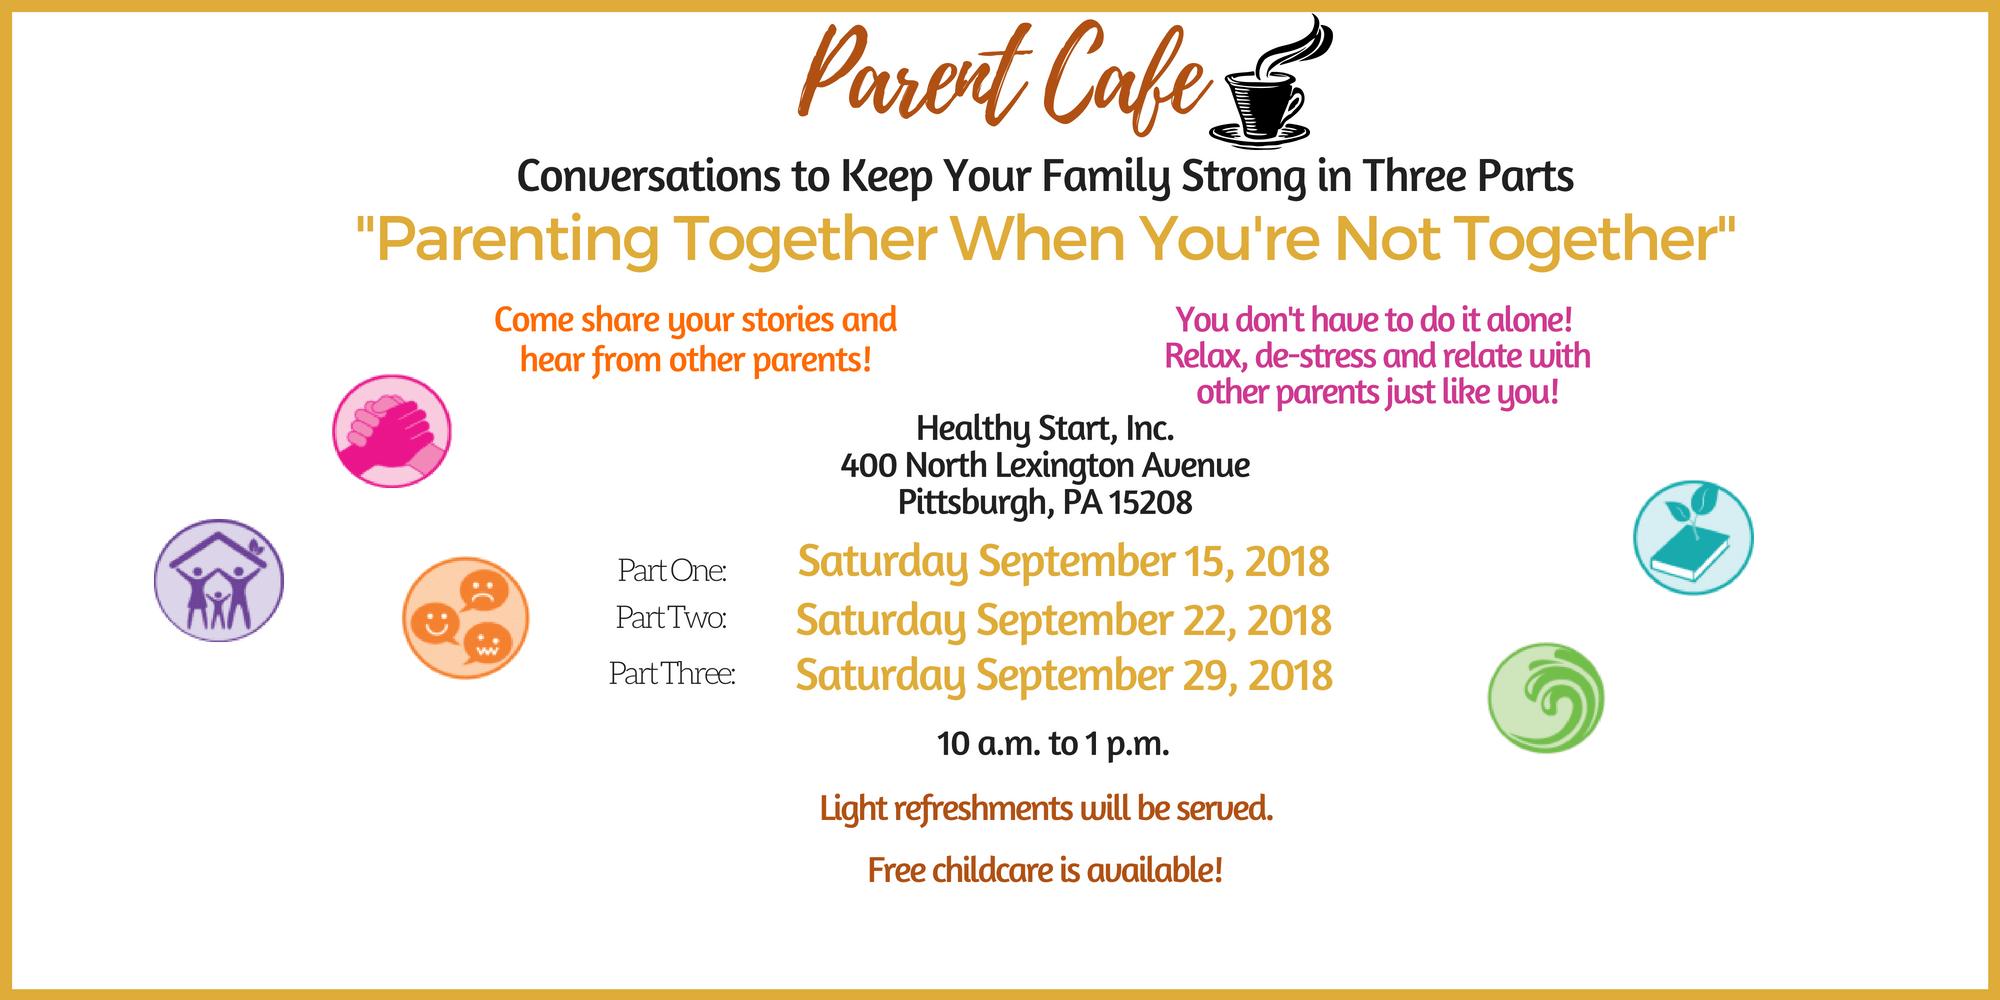 Be Strong Parent Cafe Series 3: Parenting Tog